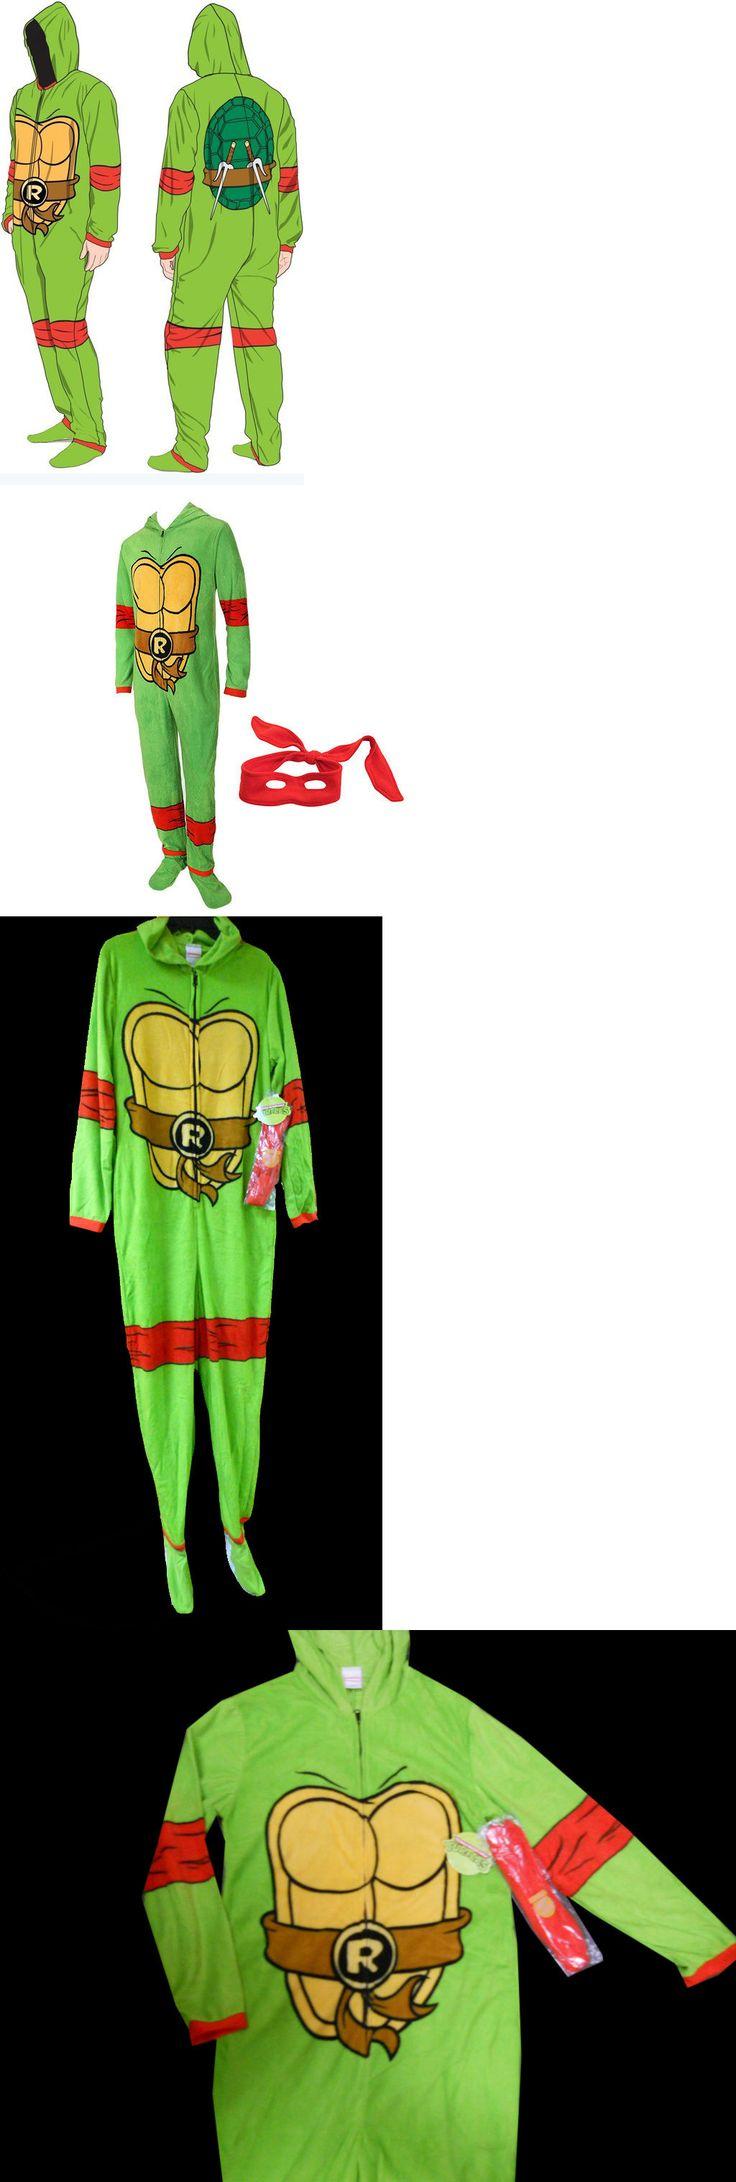 Sleepwear and Robes 11510: Mens Teenage Mutant Ninja Turtles Raphael Footed Pjs Union Suit Hood - S M L Xl -> BUY IT NOW ONLY: $34.99 on eBay!